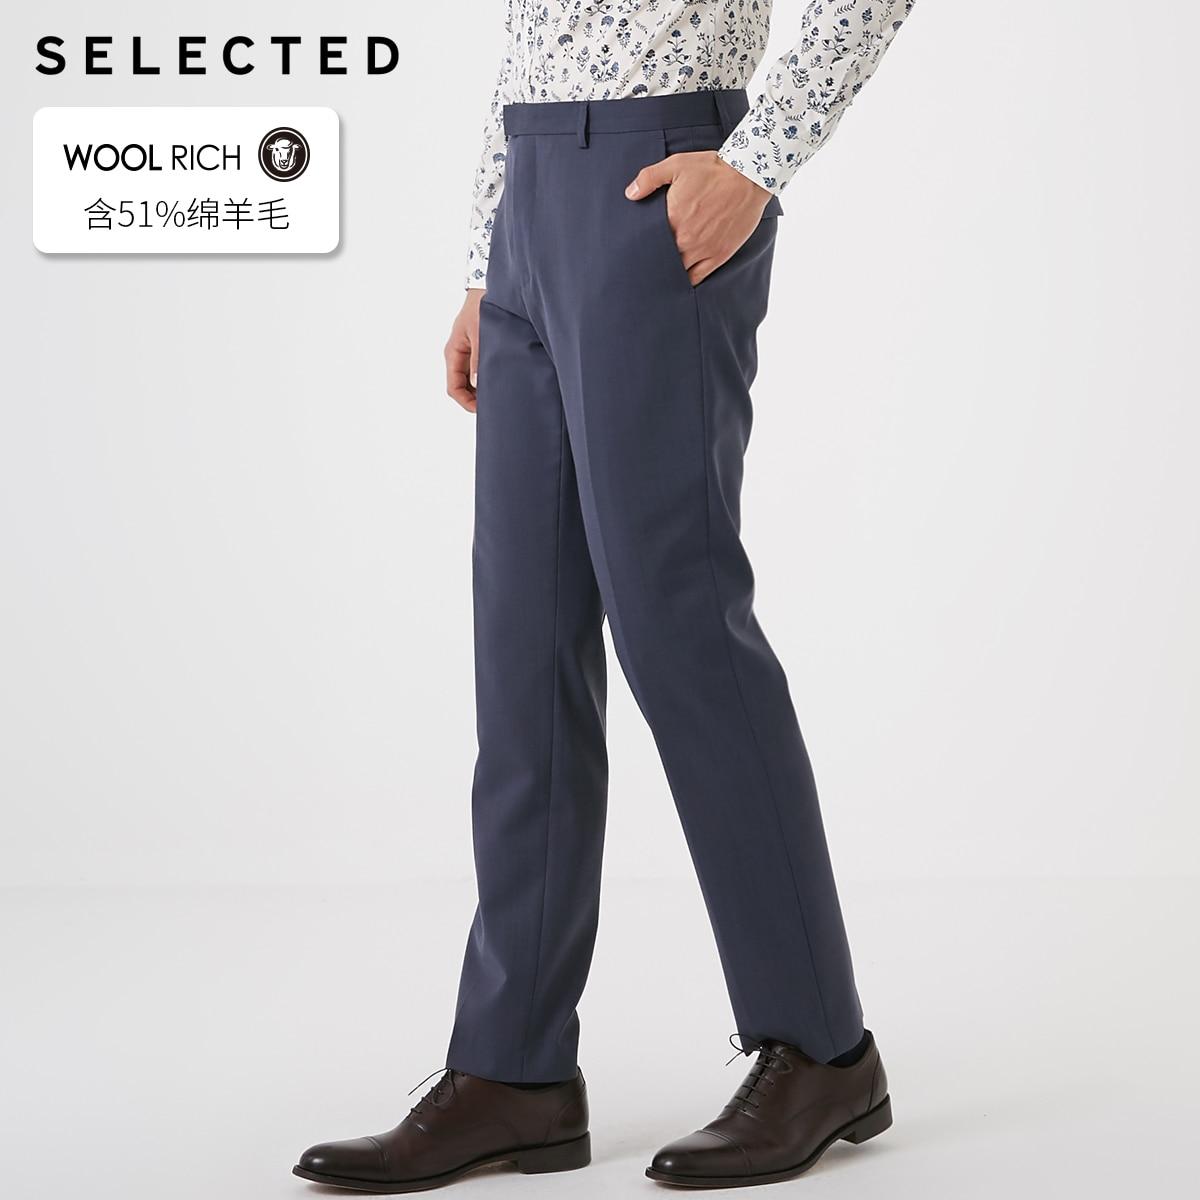 SELECTED Men's Pure Color Cotton Sheep Wool Regular Fit Suit Pants T|41916B510